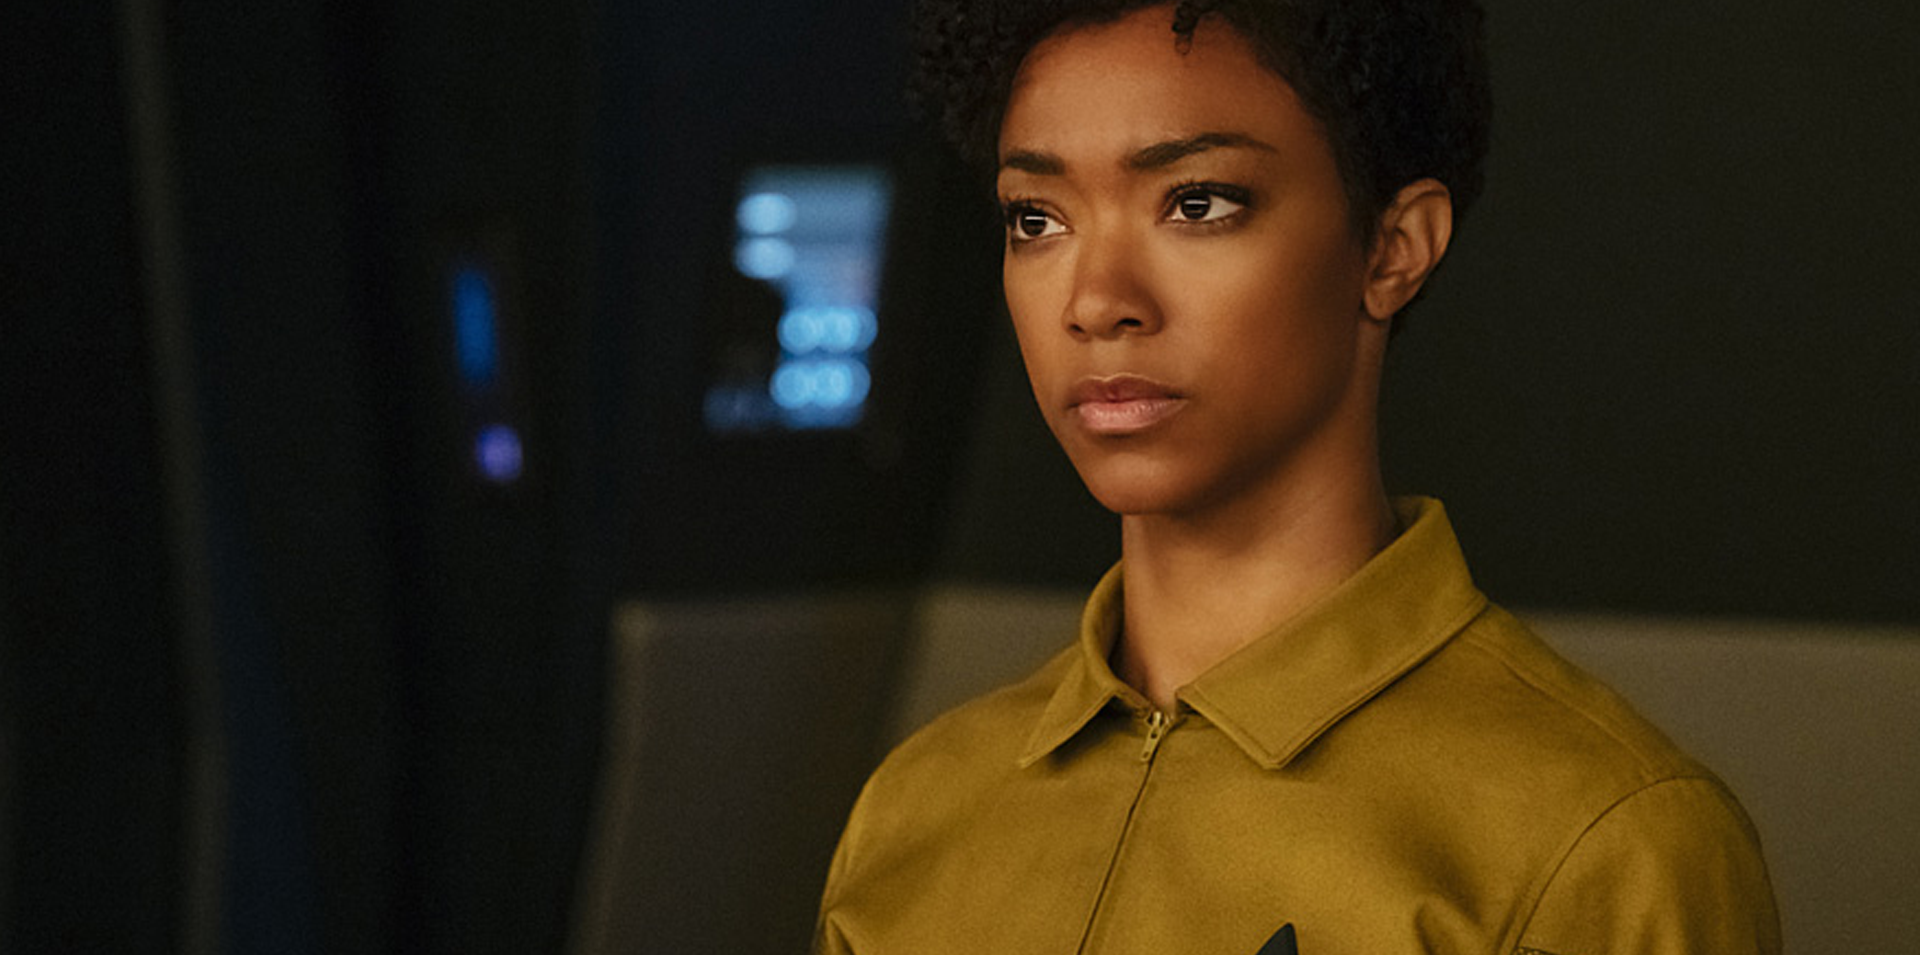 Star Trek: DiscoveryHas Suddenly Changed Showrunners Again